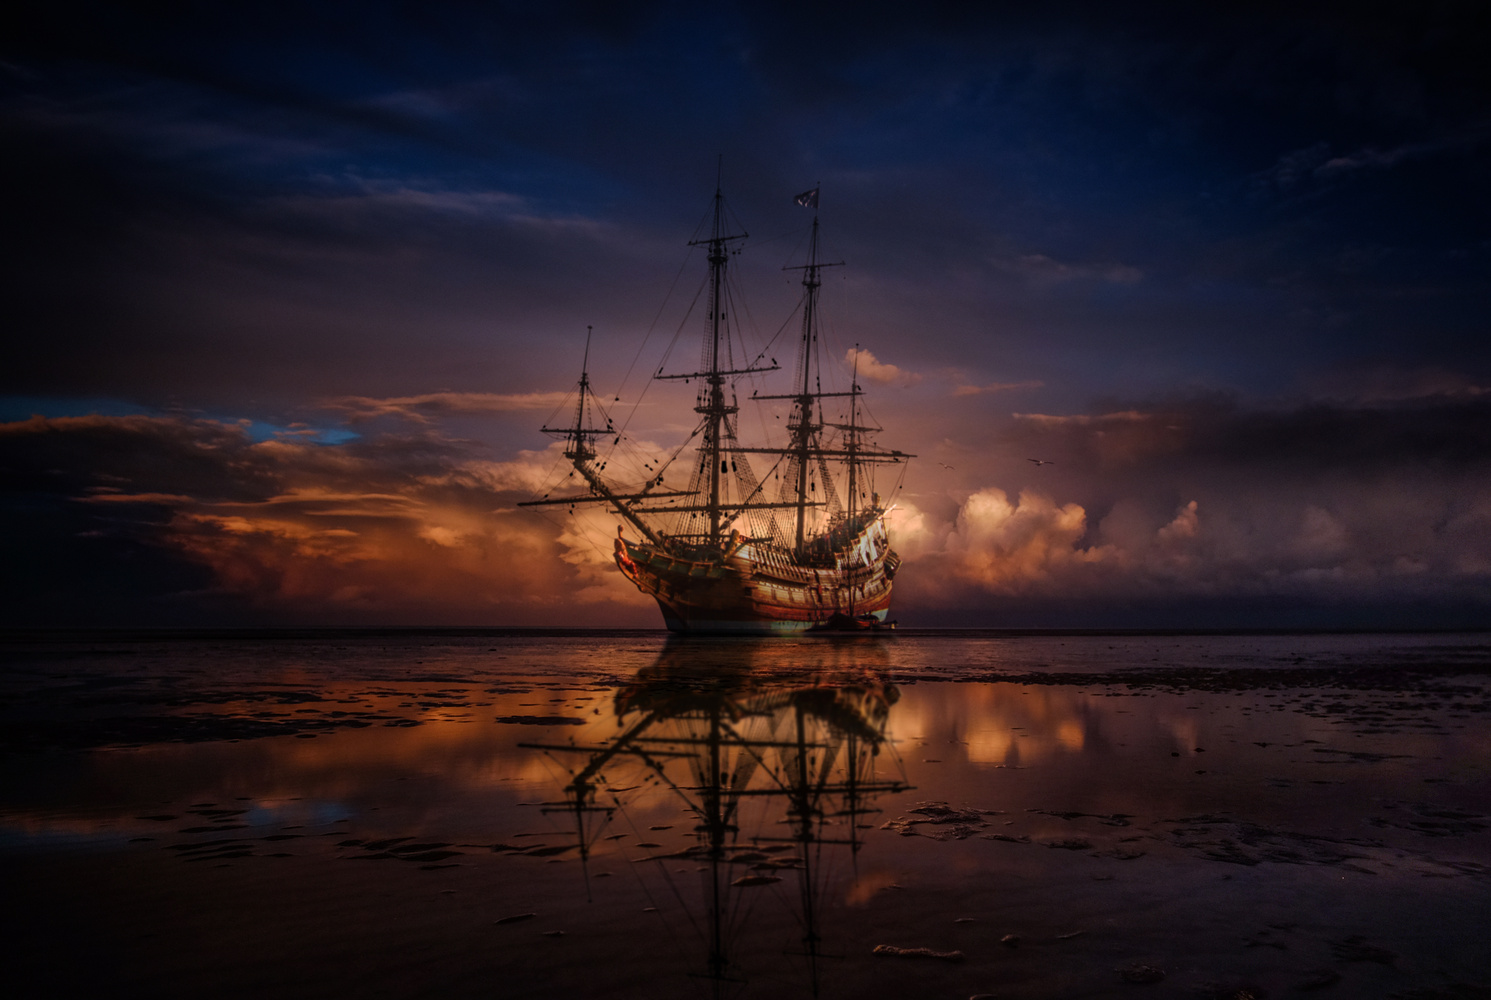 Sparrow by Zoltan Tasi